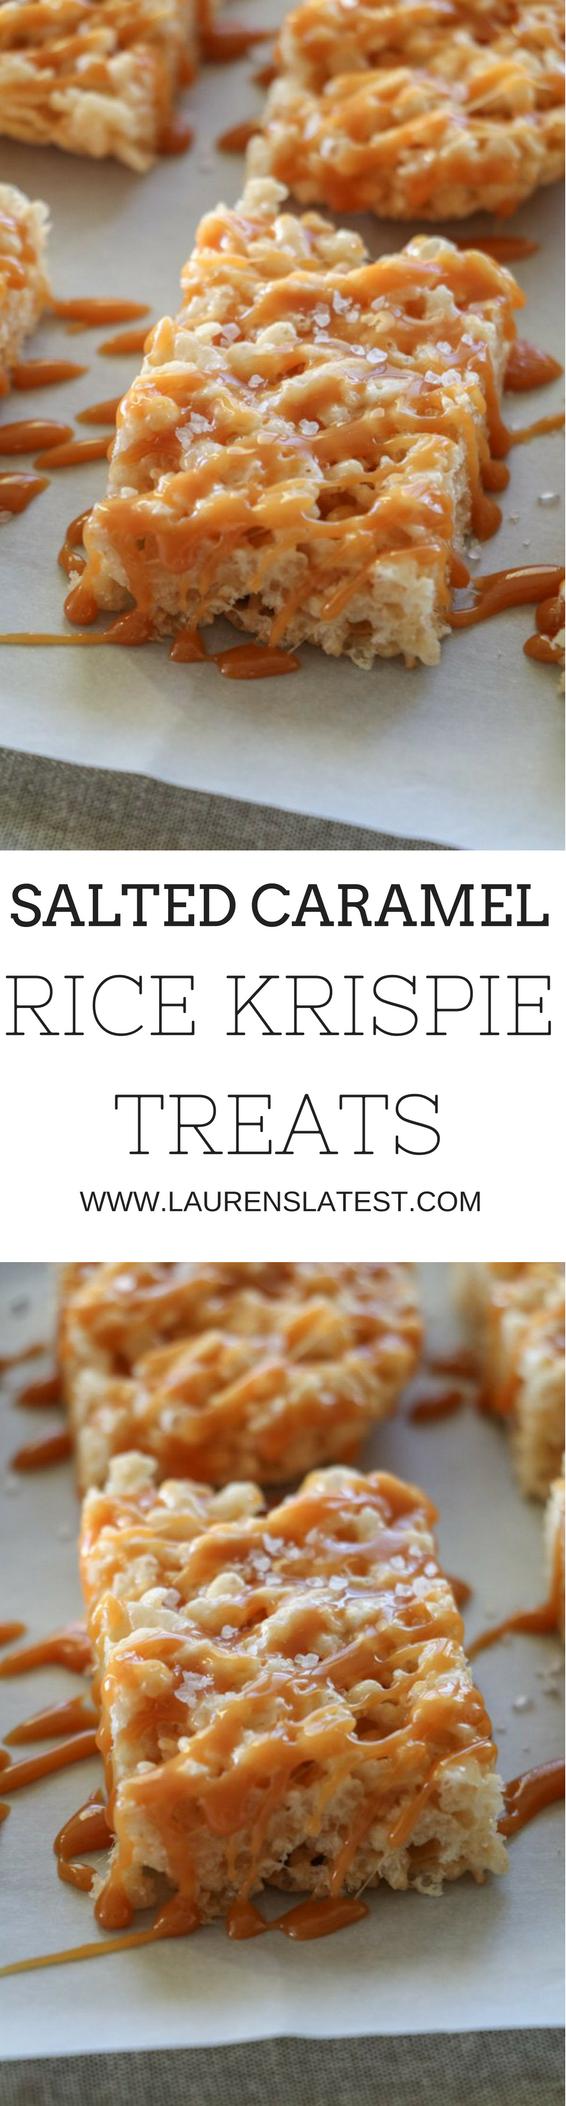 Salted Caramel Rice Krispie Treats...15 minutes to dessert time! (Dessert Recipes Christmas)